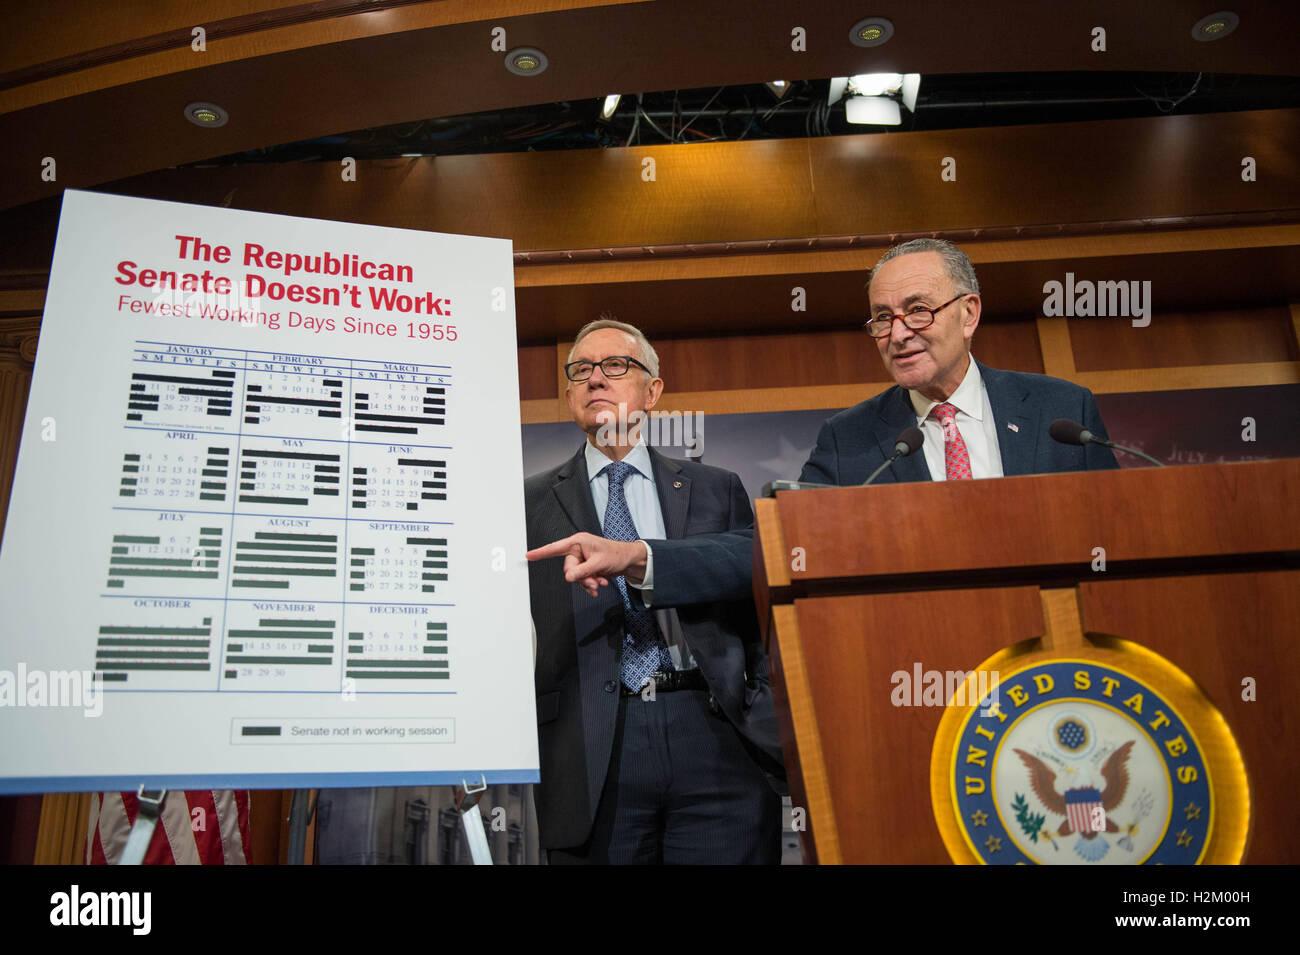 Washington DC, USA. 29th September, 2016. U.S. Democratic Senators Chuck Schumer and Harry Reid highlight the failures - Stock Image